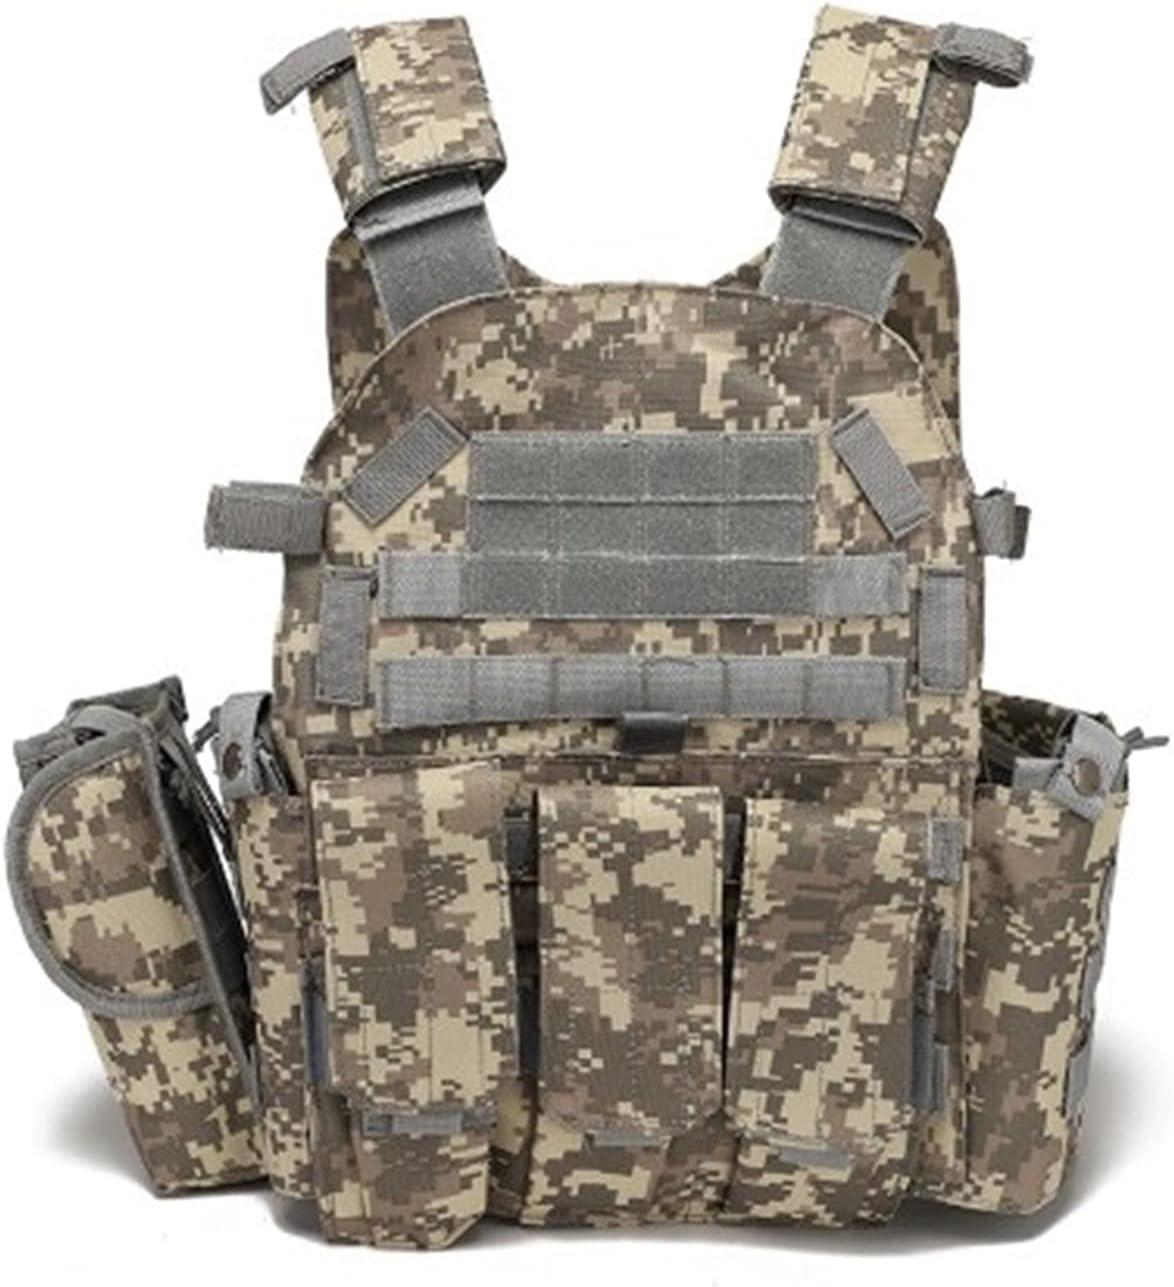 DZJUKD Chaleco táctico , Chaleco de Caza Tactical Militar JPC Placa Placer Chaleco Ammo Airsoft Paintball Gear Gear Hunting Tactical Gear Armor Chaleco para Entrenar Juegos de Paintball